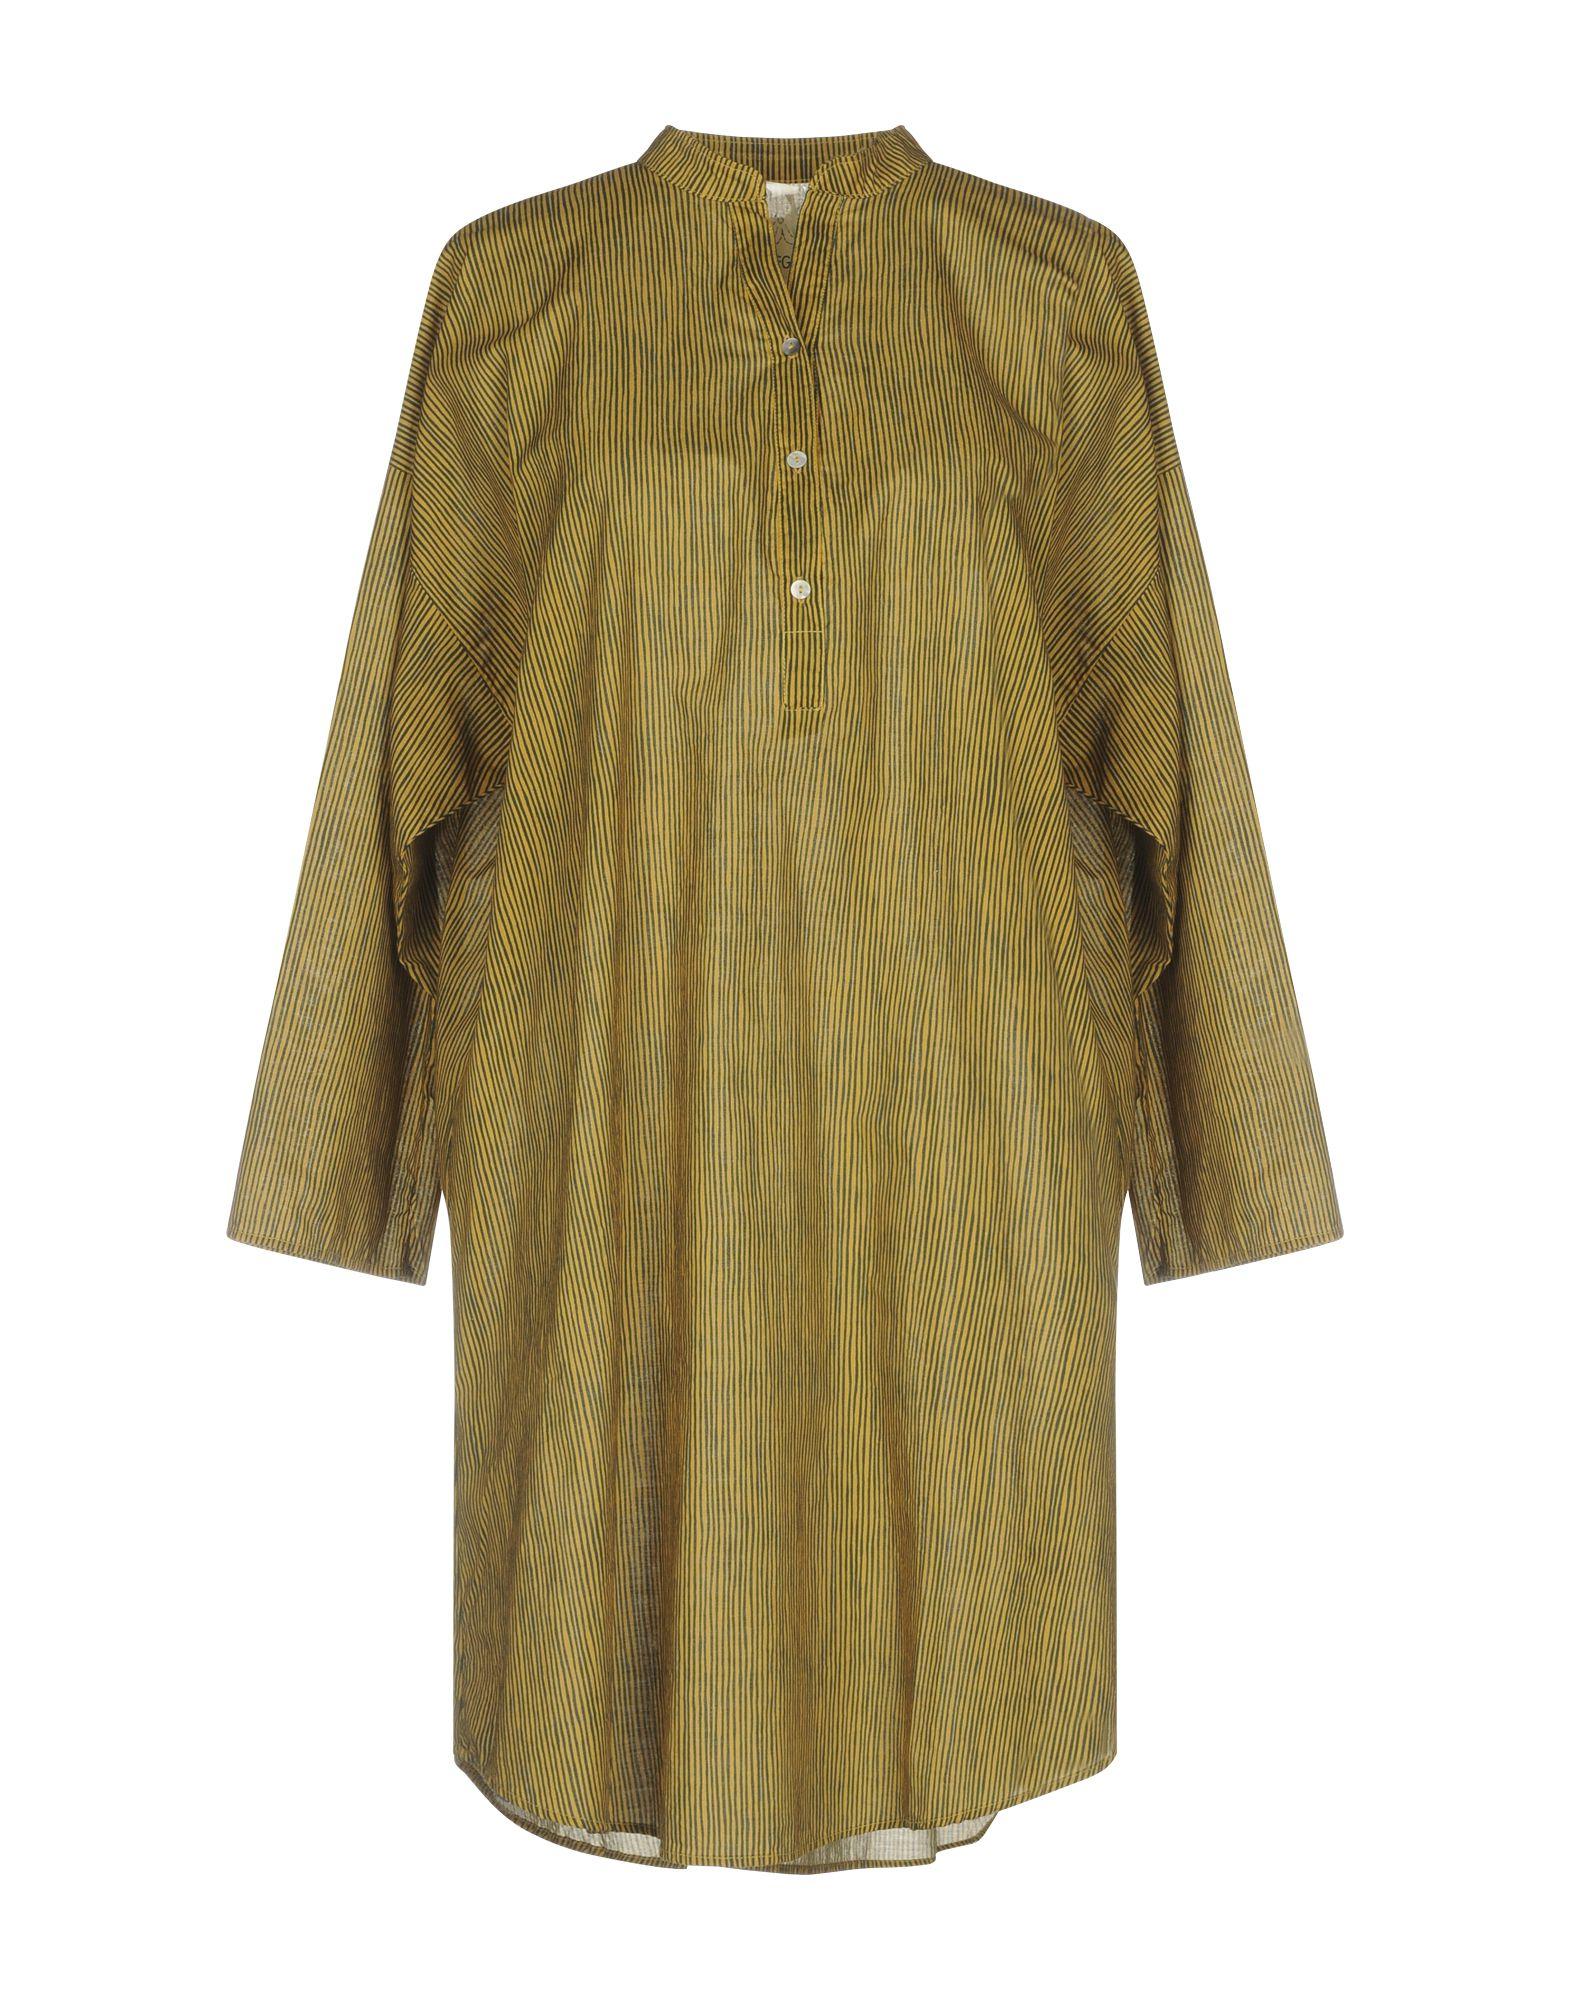 DIEGA Shirt Dress in Ocher